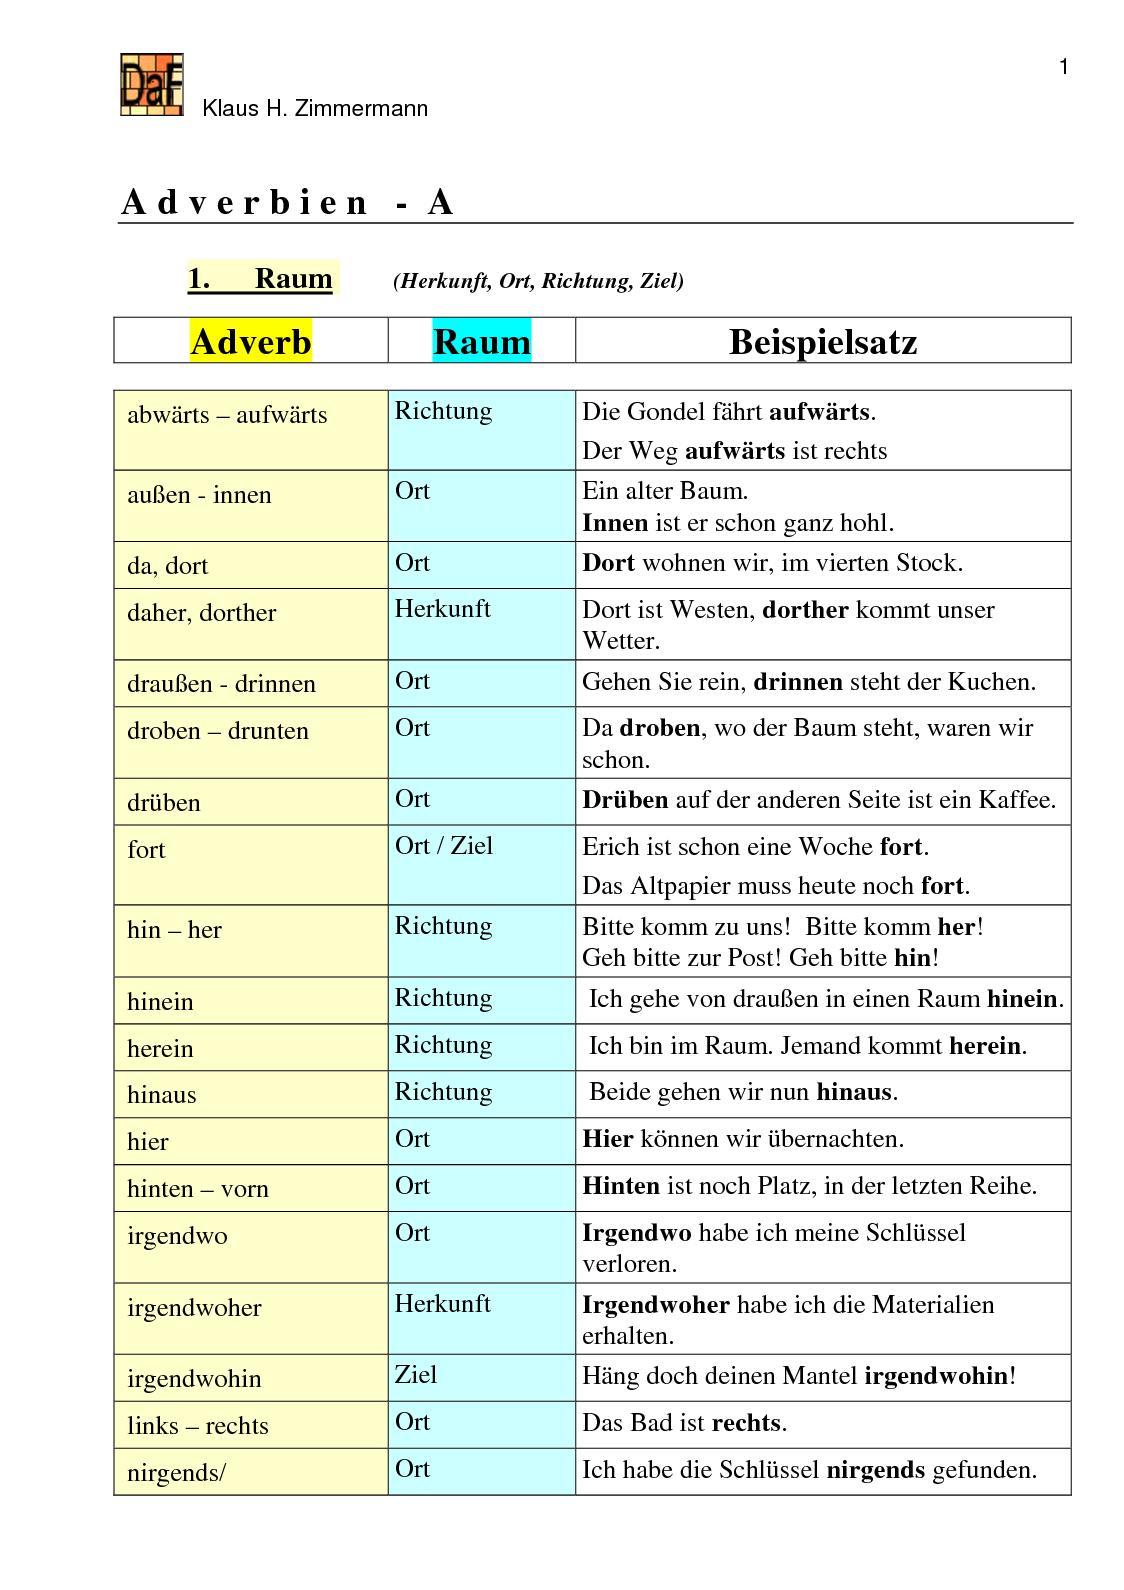 Calaméo - Adverbien, Klaus H. Zimmermann